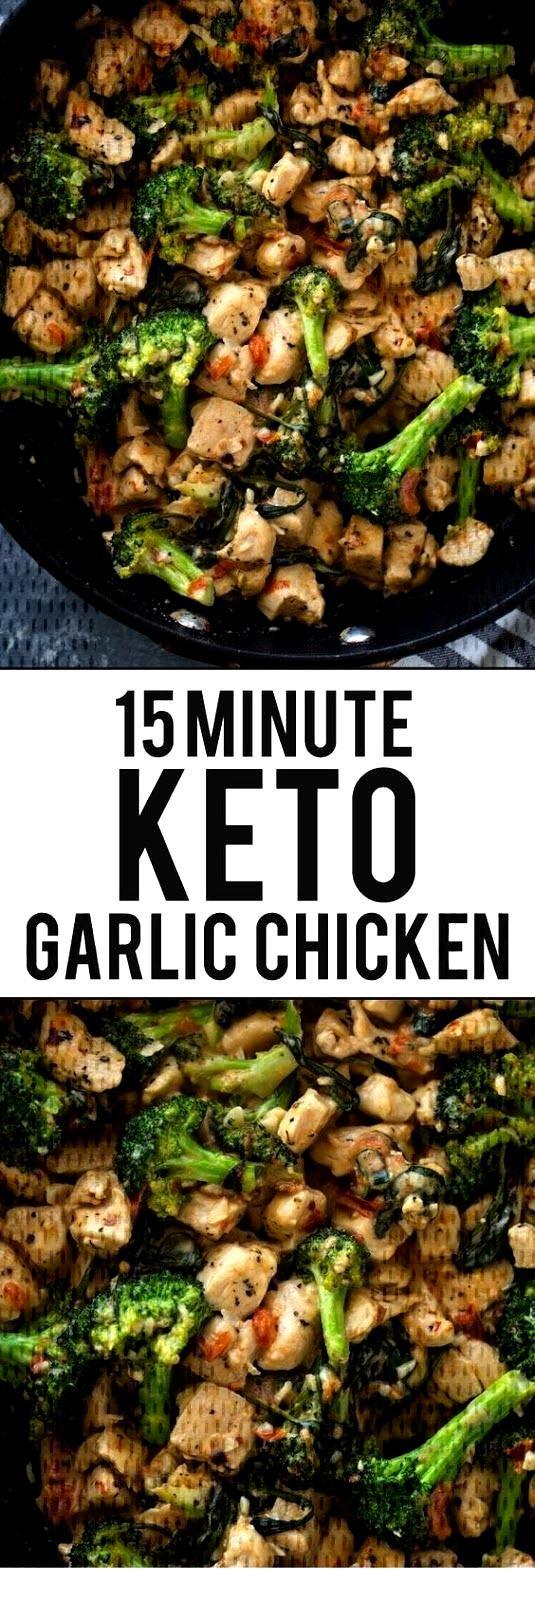 15 Minute Keto Garlic Chicken with Broccoli and Spinach | Keto Recipes | -